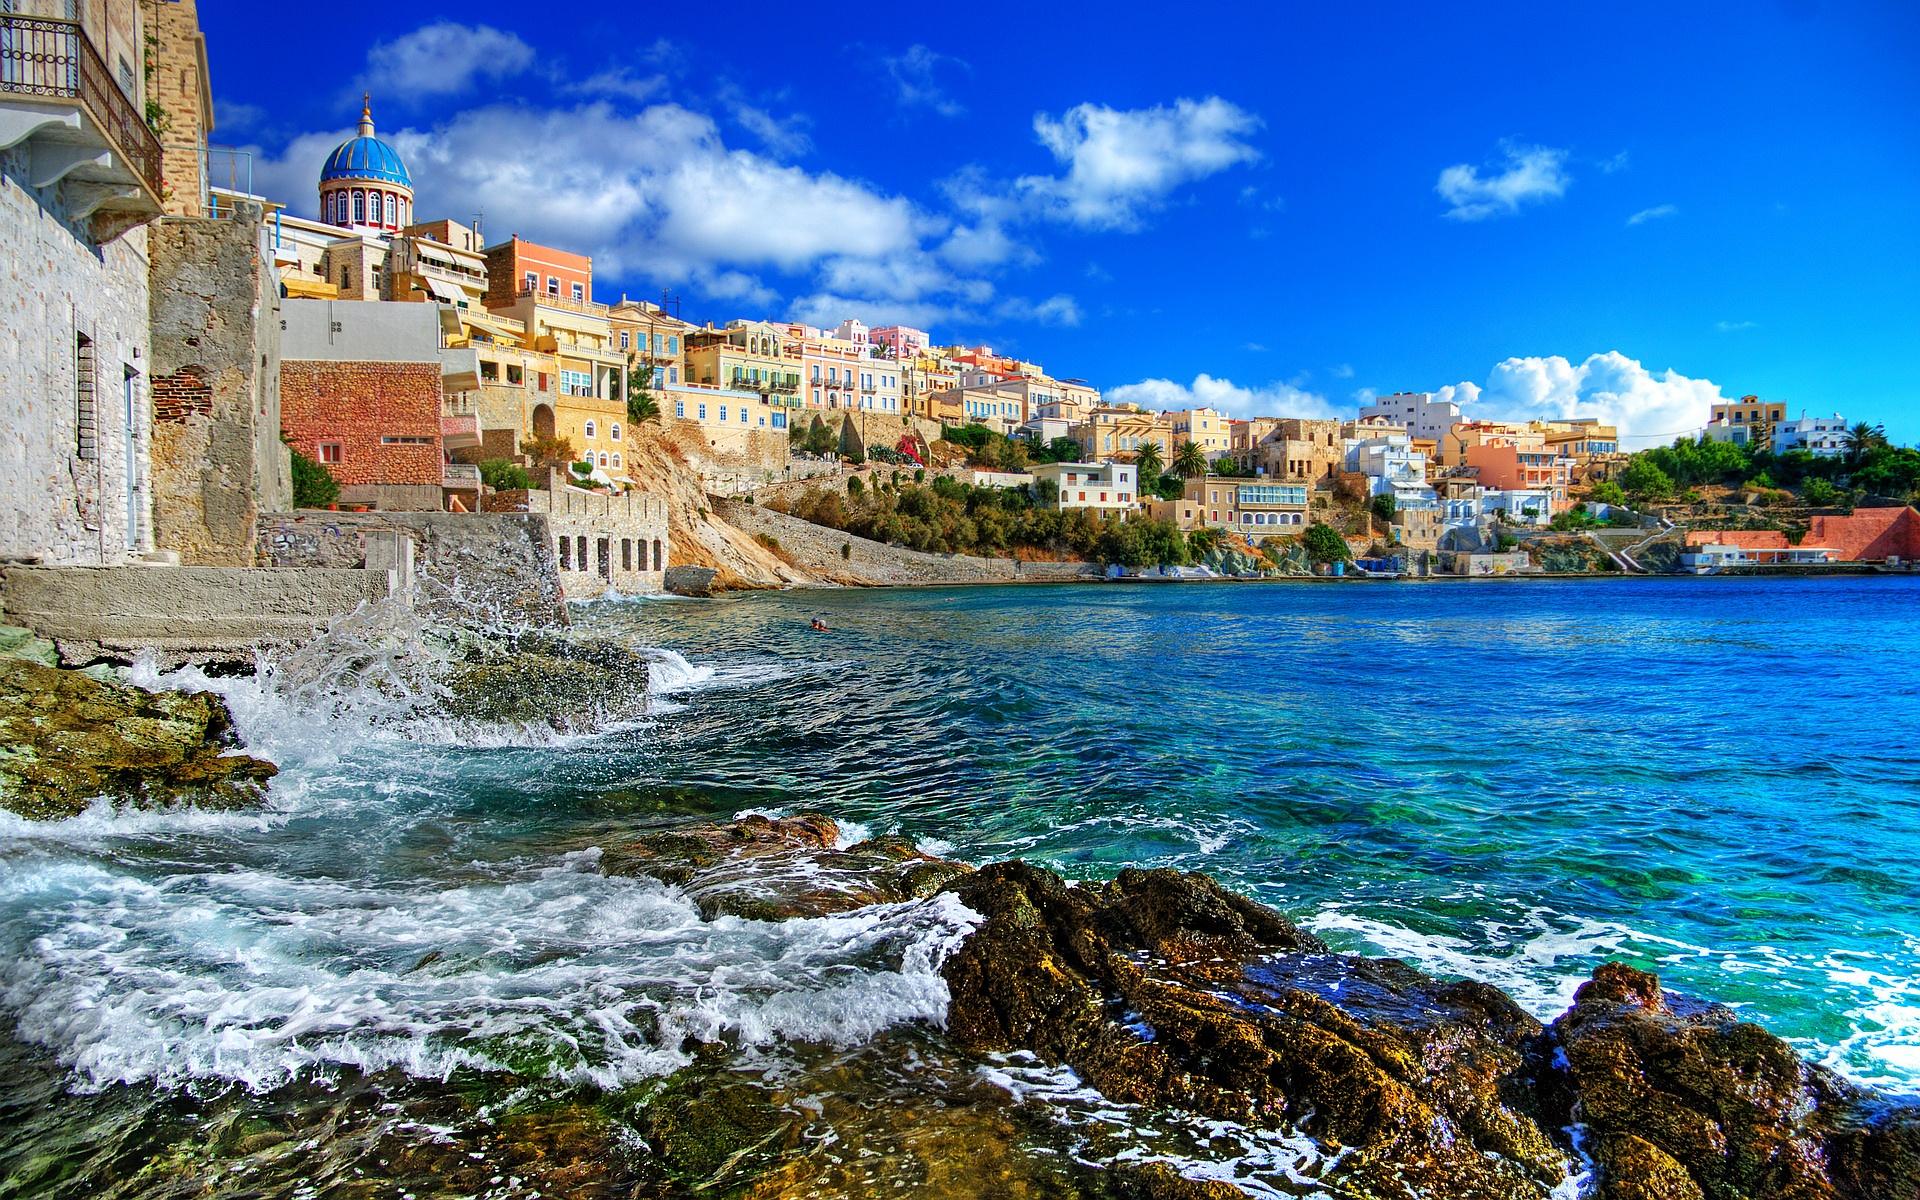 Syros Island Greece wallpaper 1920x1200